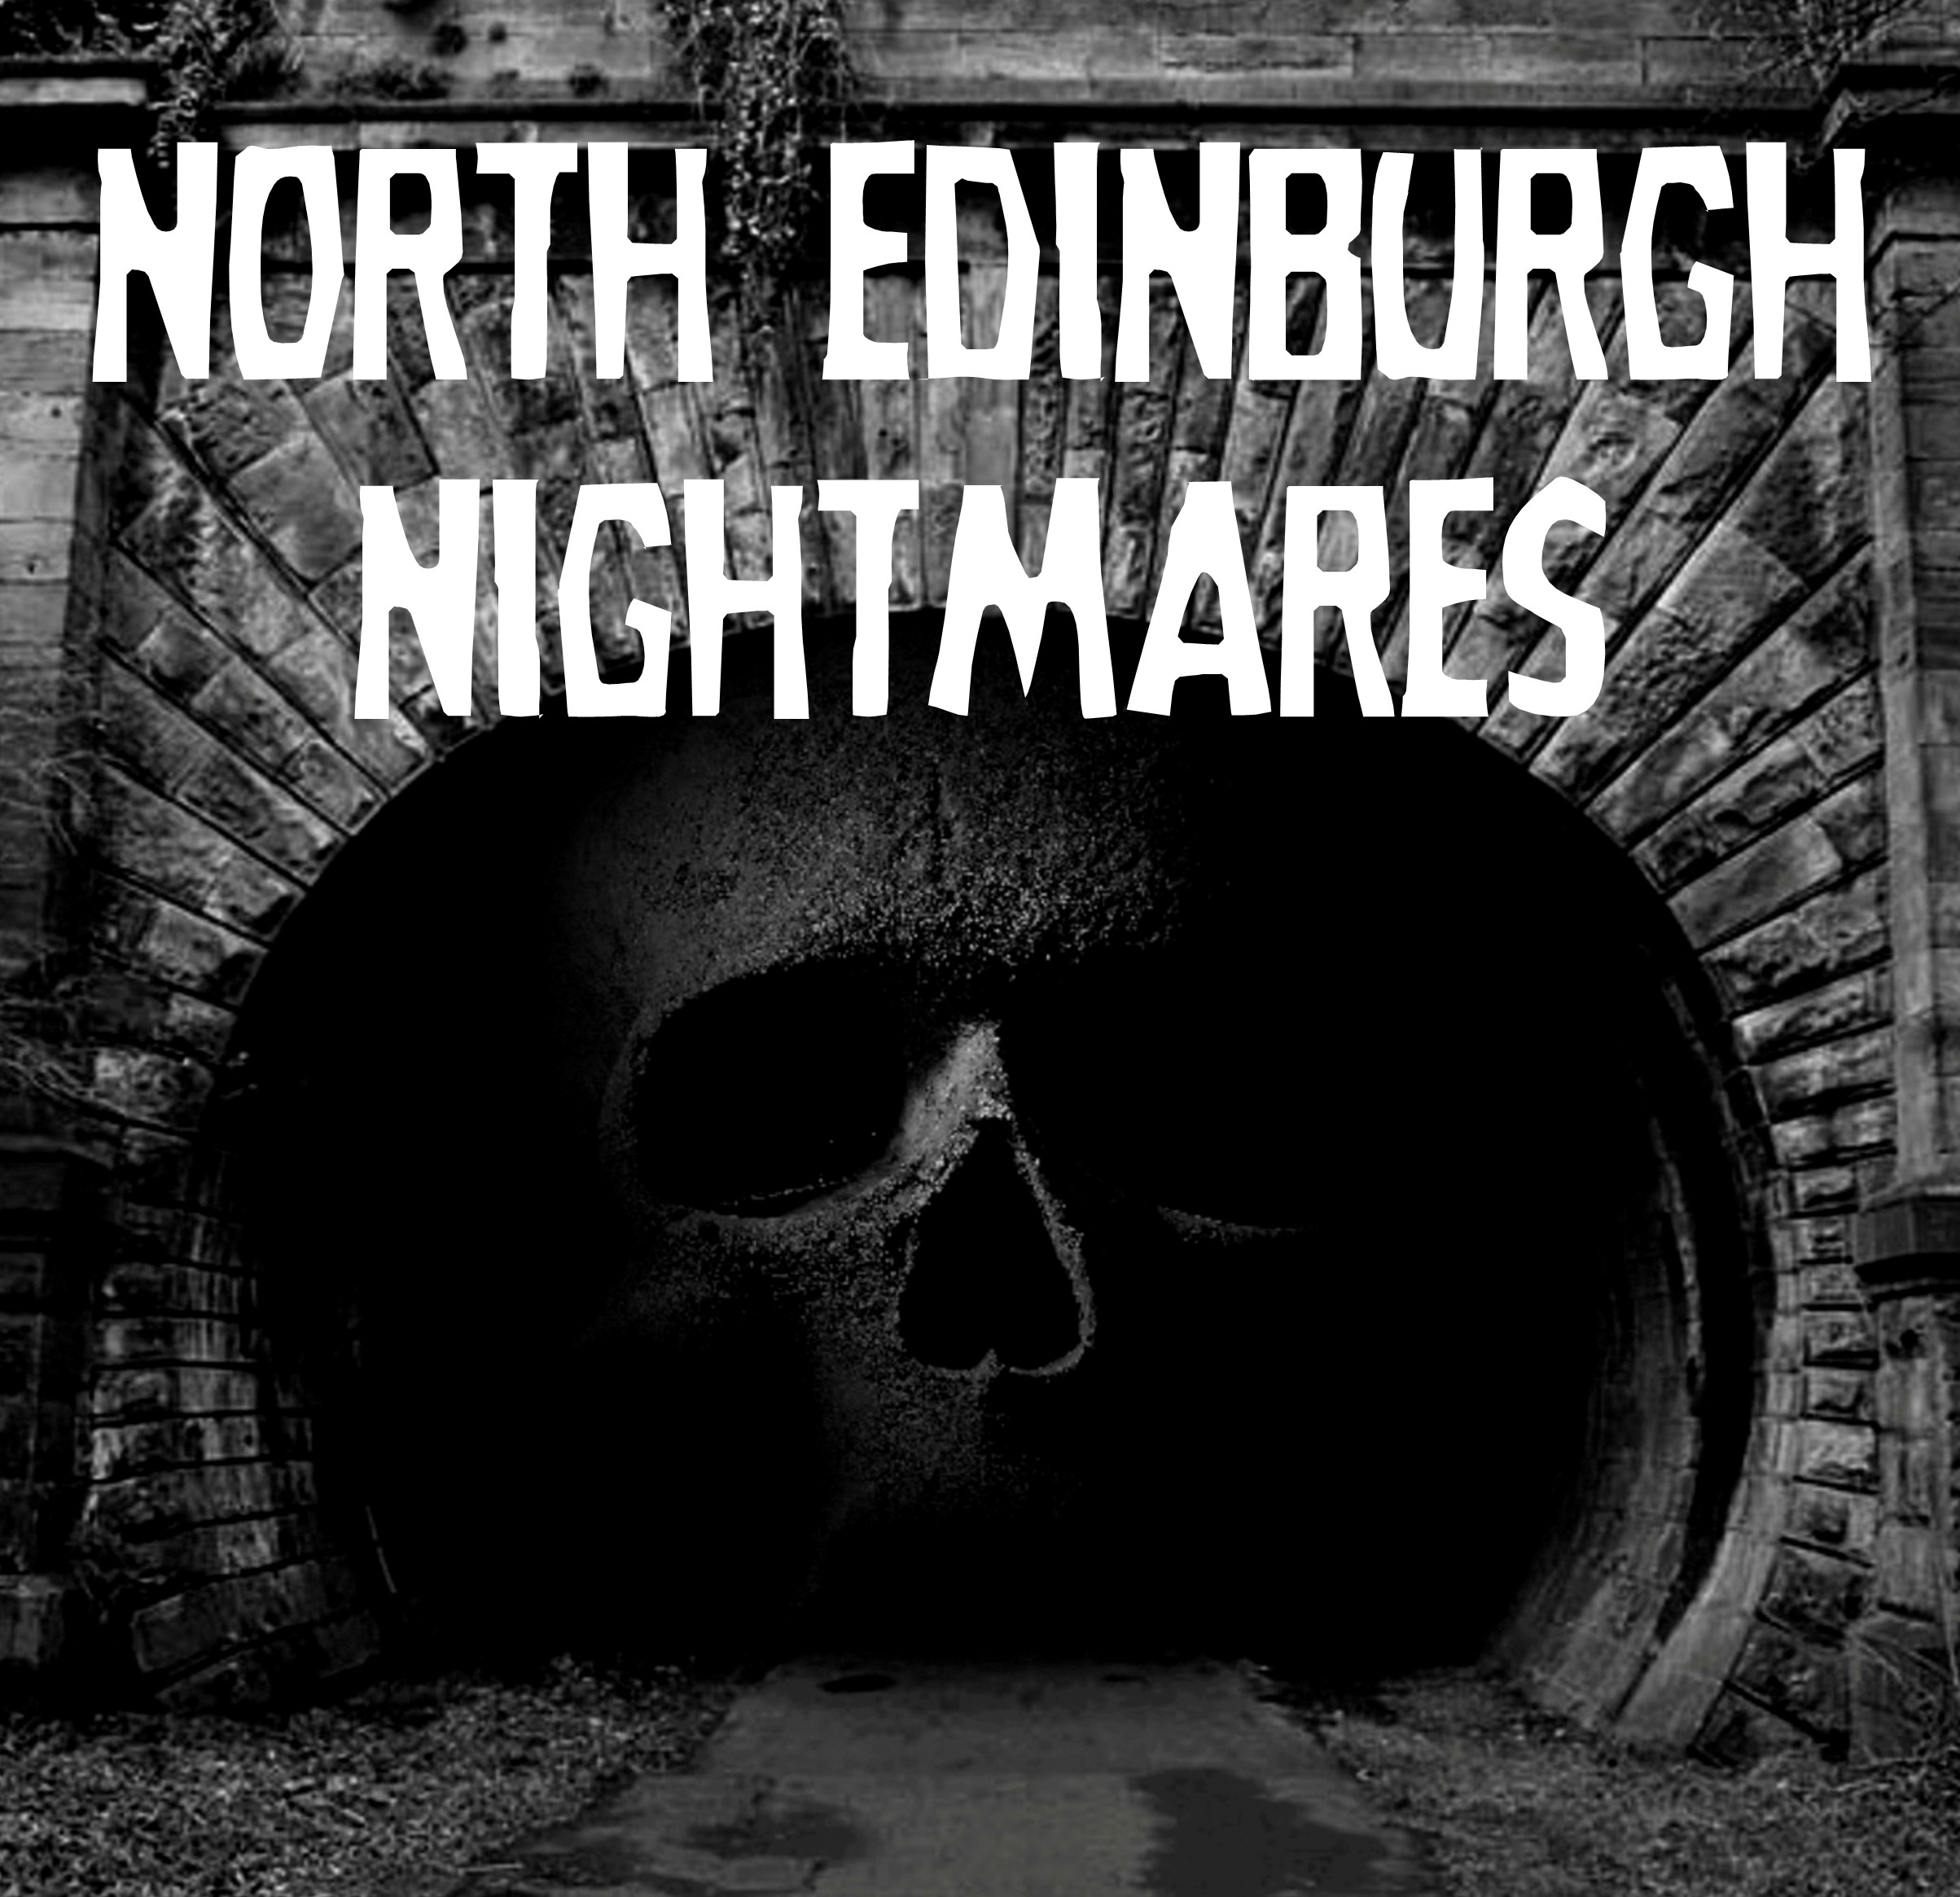 North Edinburgh Nightmares